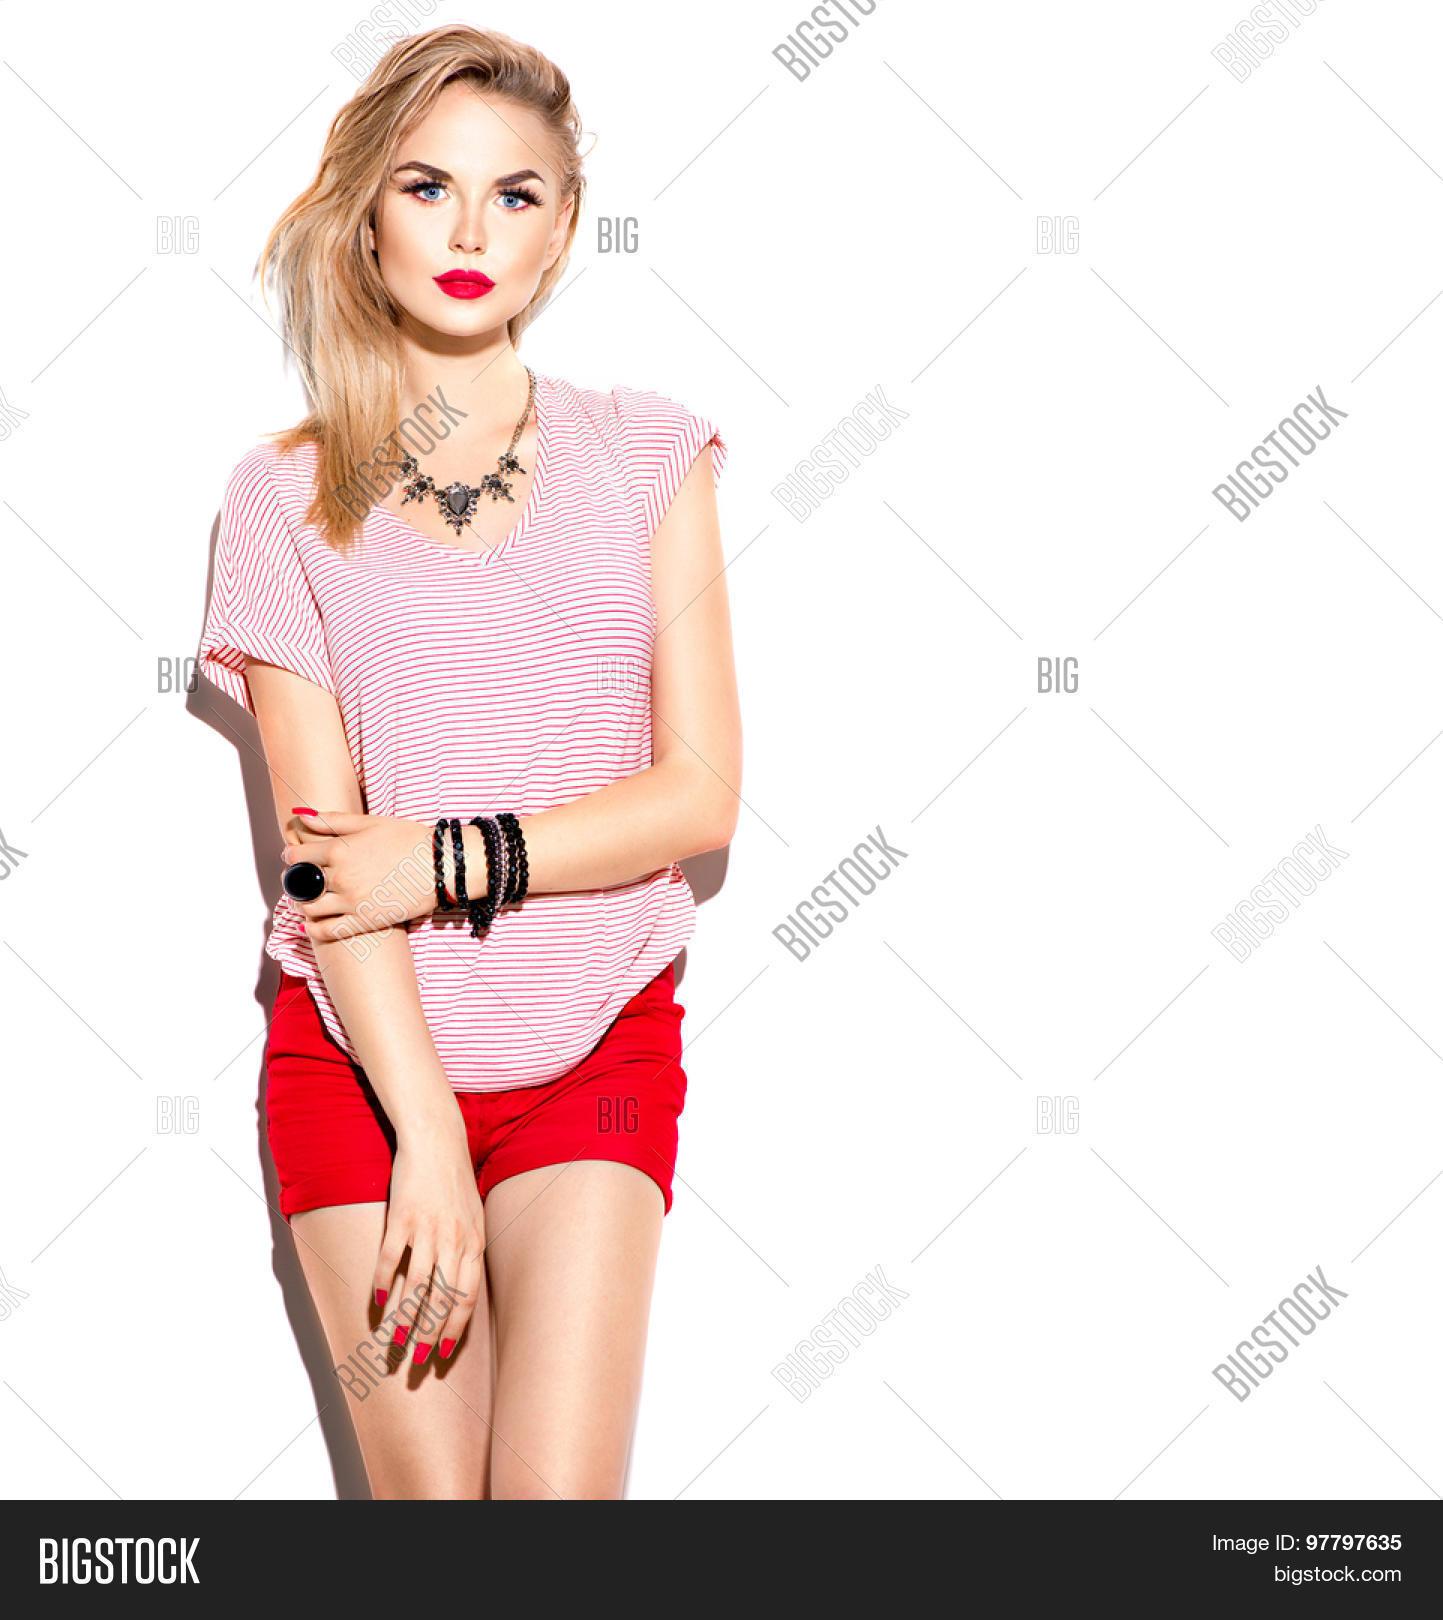 Young fashionable girl photo